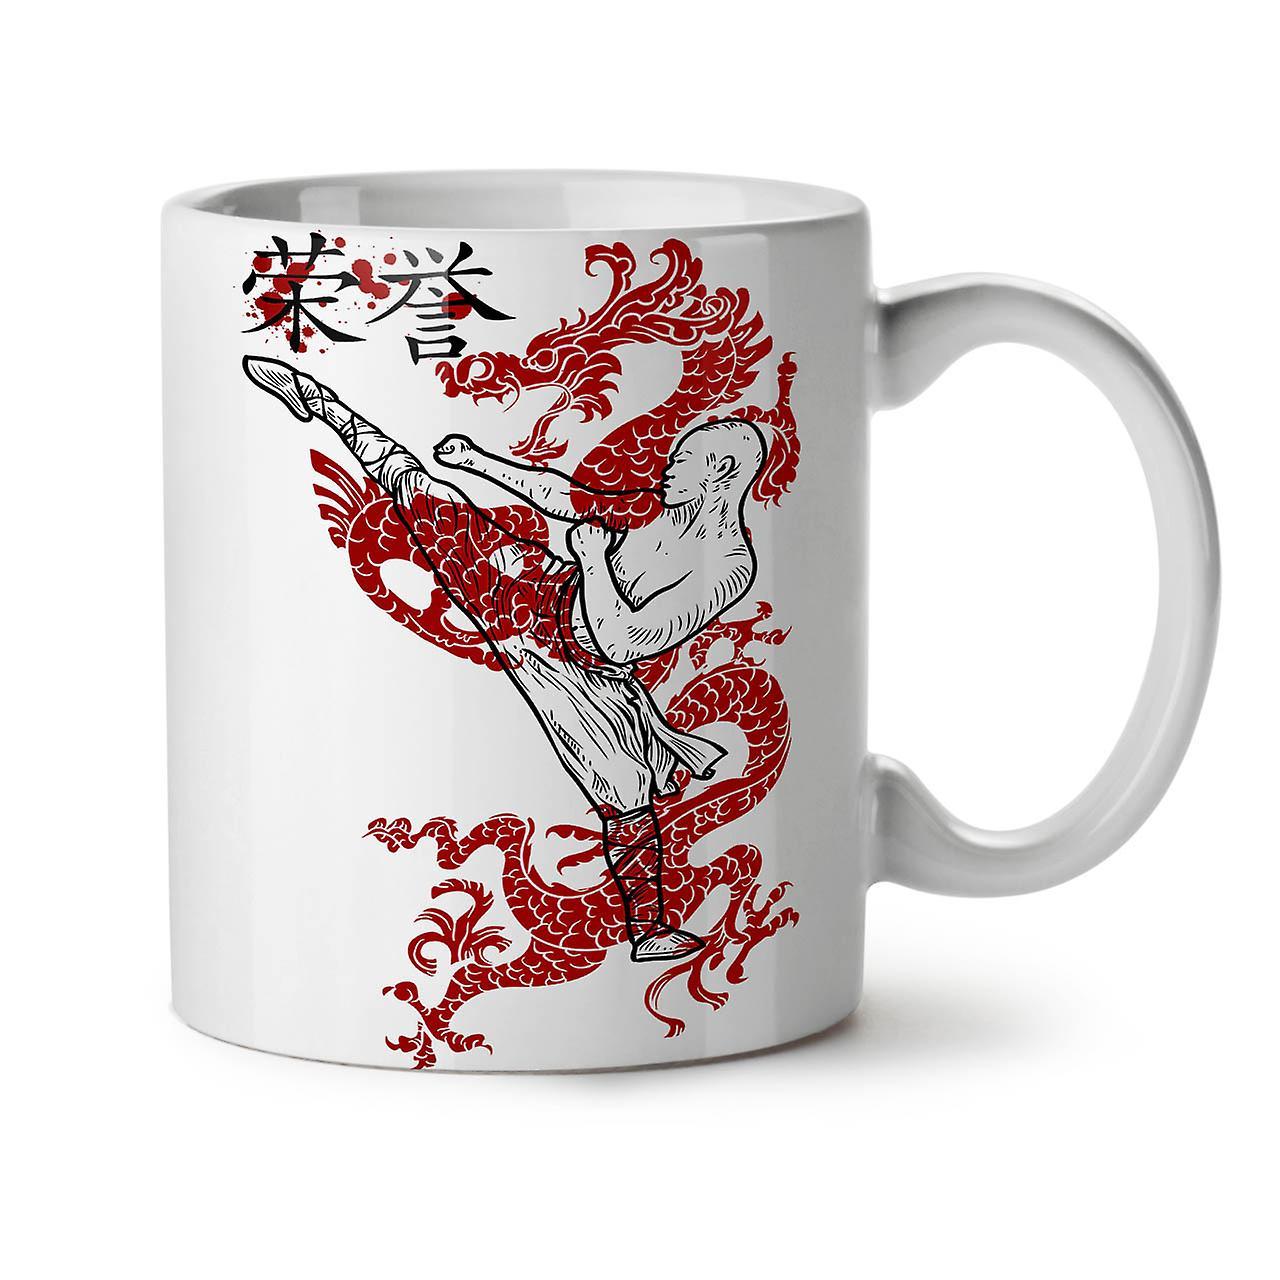 Warrior Thé Céramique Blanc 11 Café OzWellcoda Nouveau Dragon Ninja Tasse kiTZwOPXu